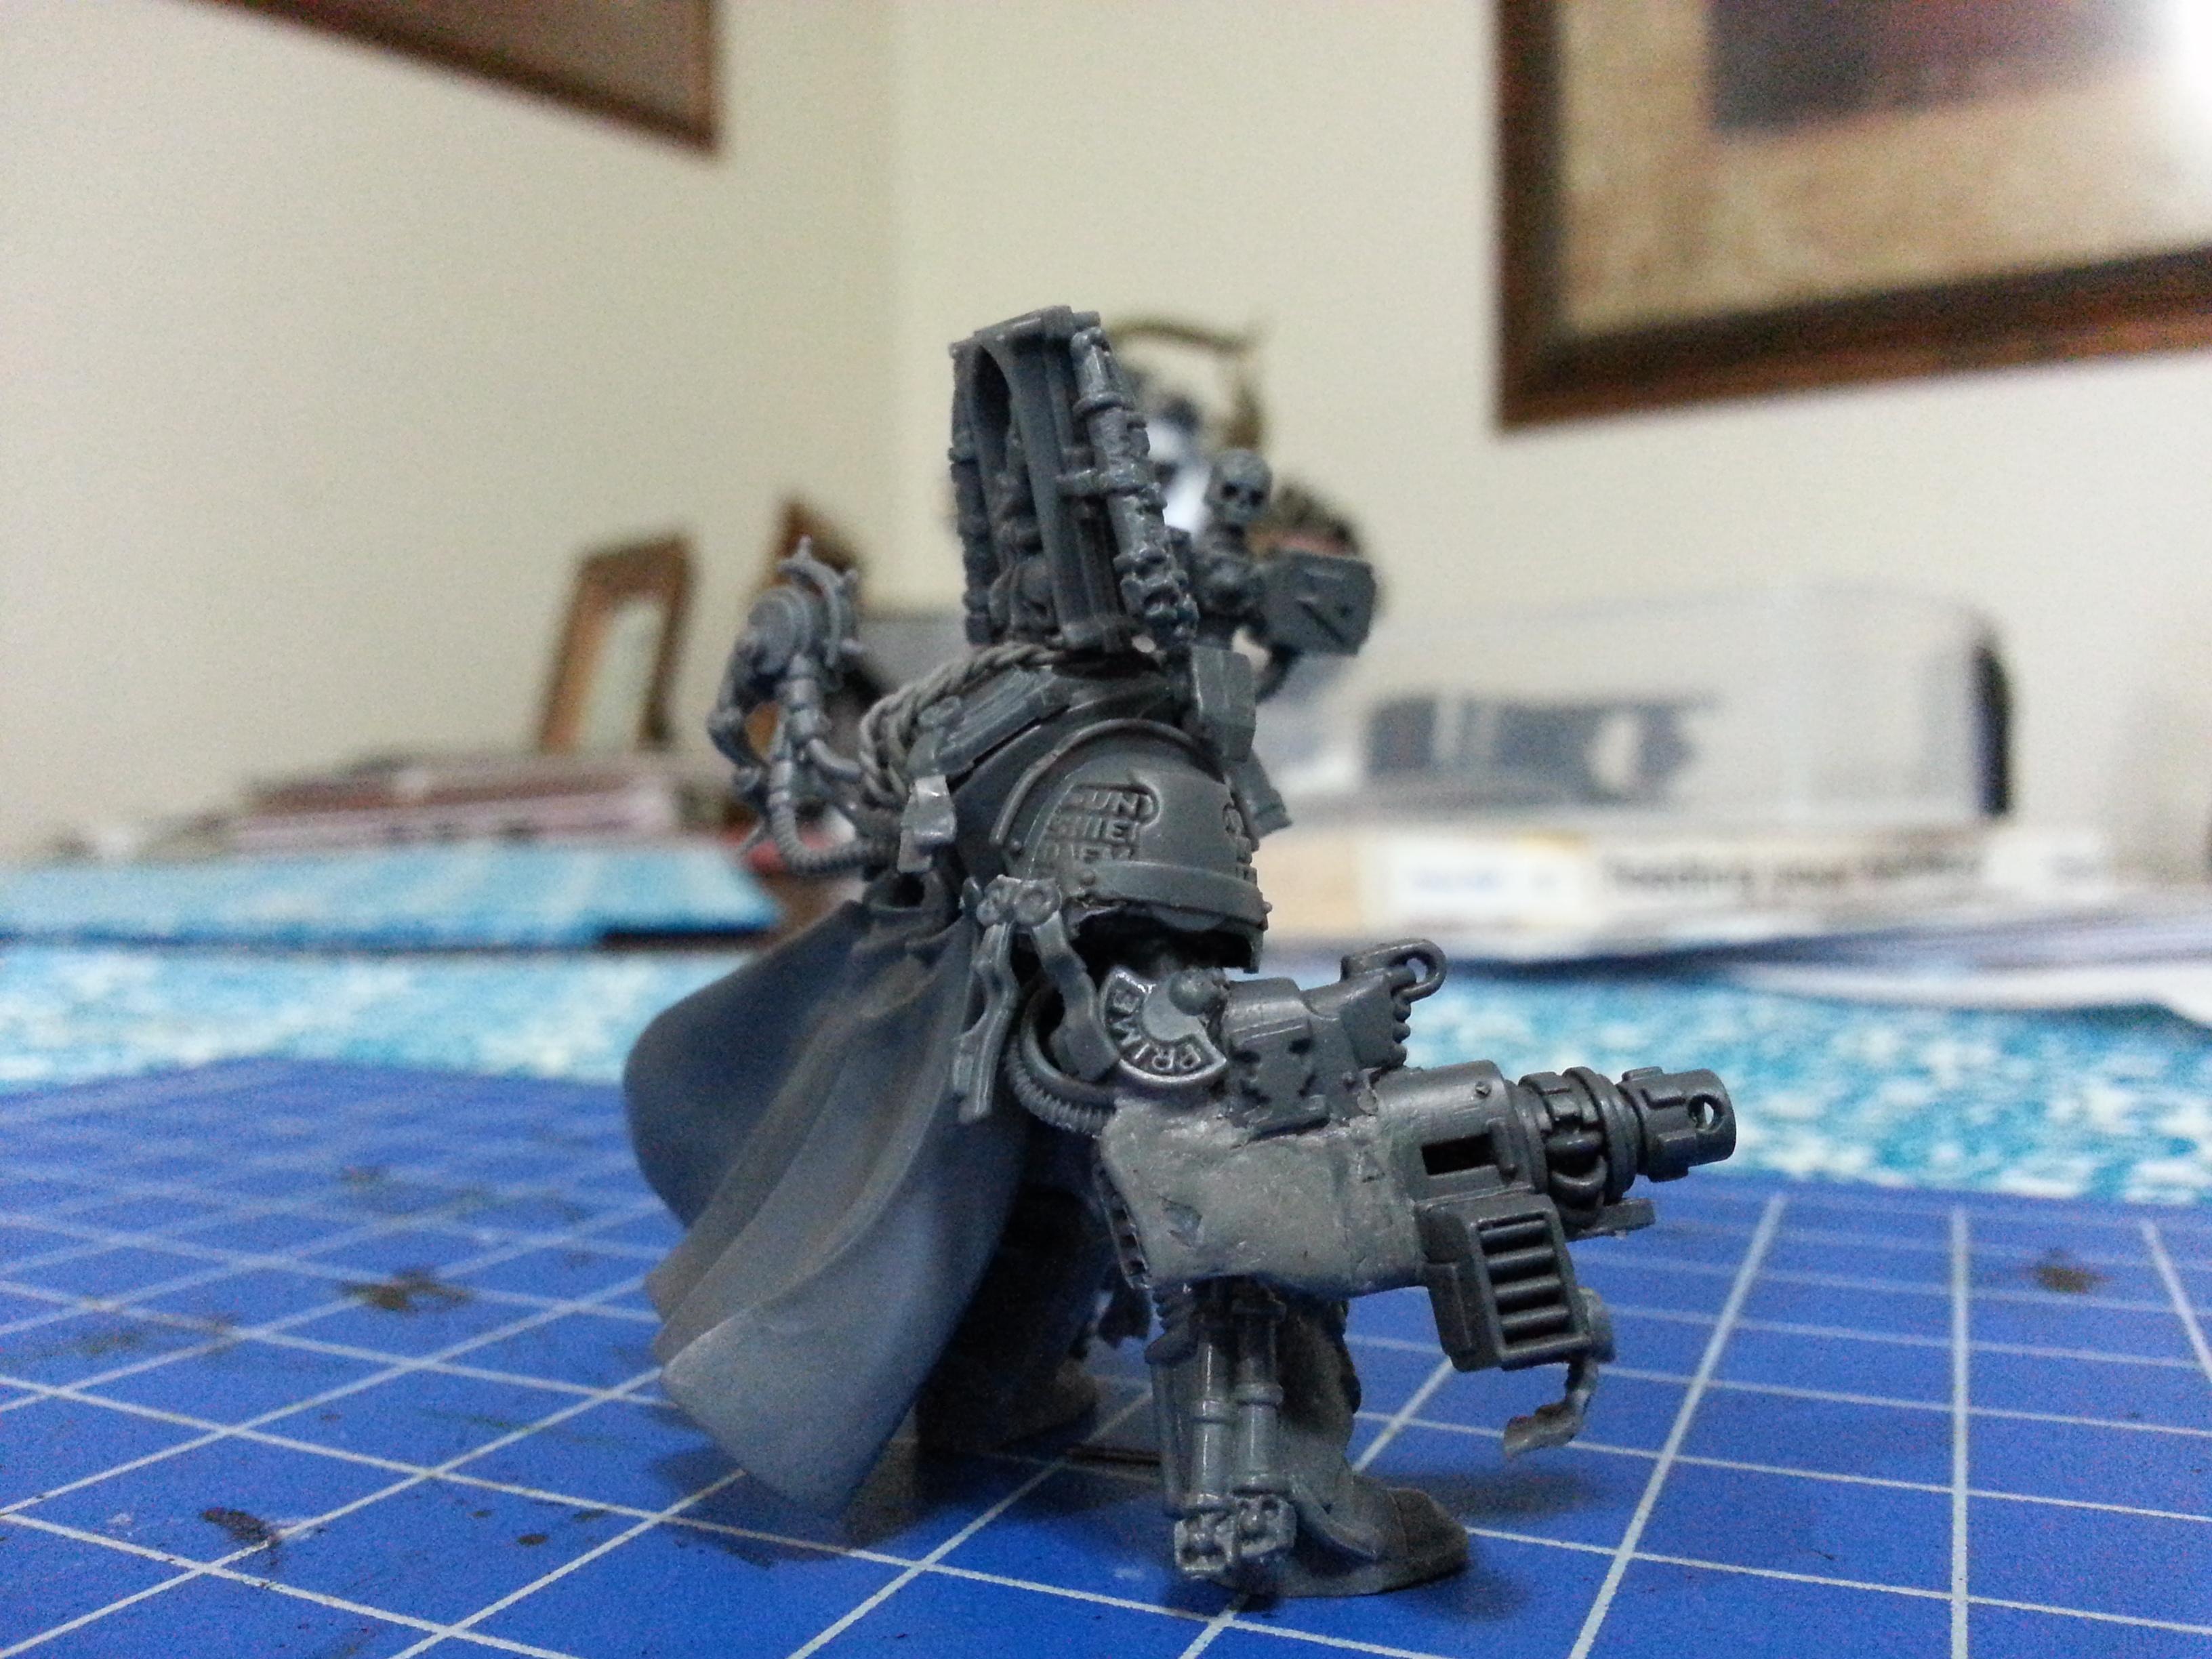 Grey Knights, Inquisitor, Malleus, Ordo, Space Marines, Terminator Armor, Warhammer 40,000